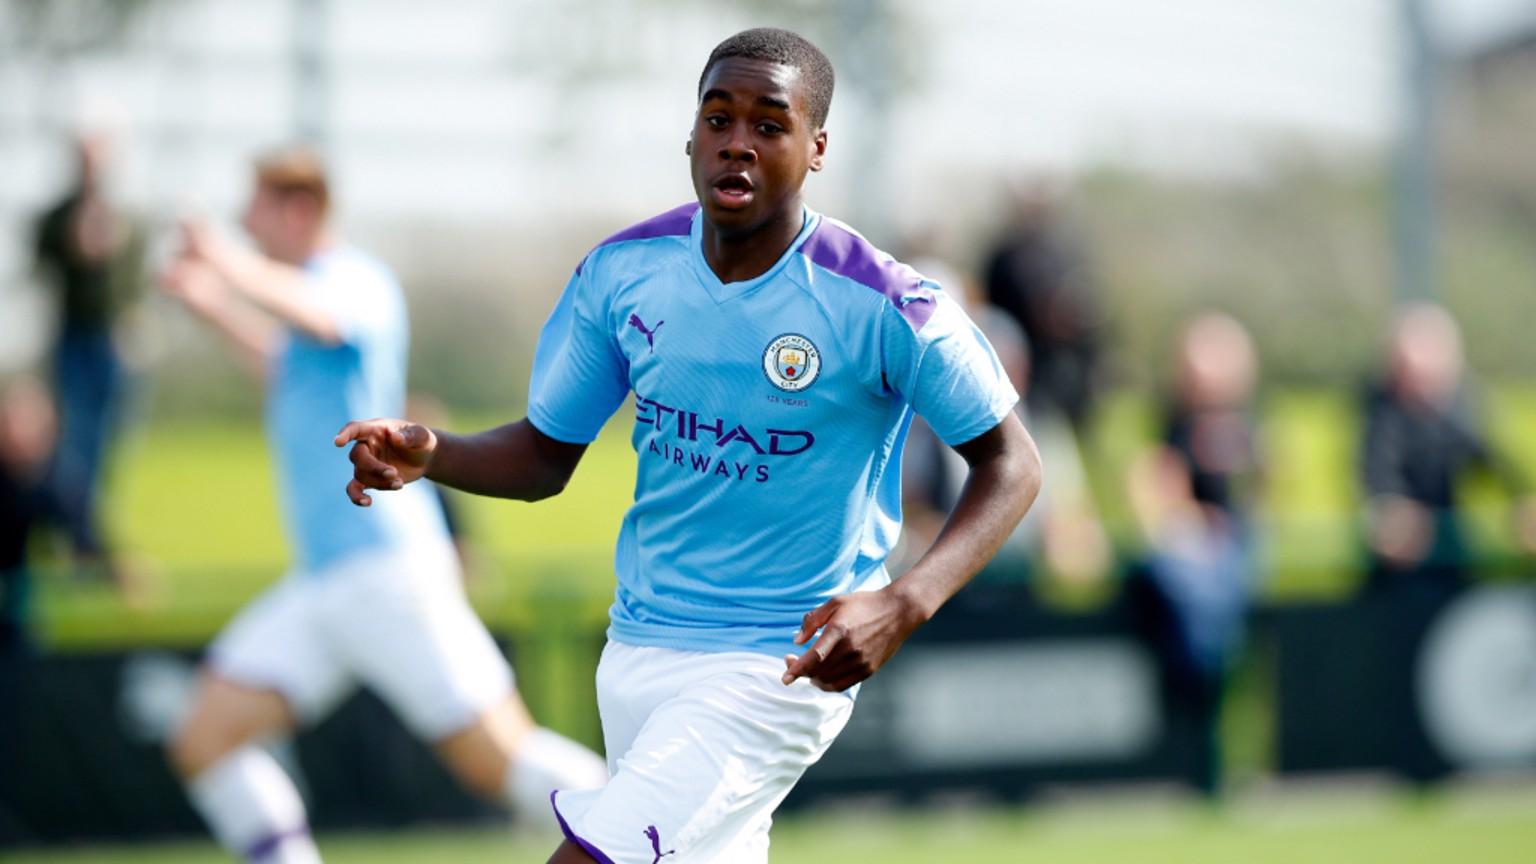 CLOSE CALL: City just fell short against Blackburn Rovers